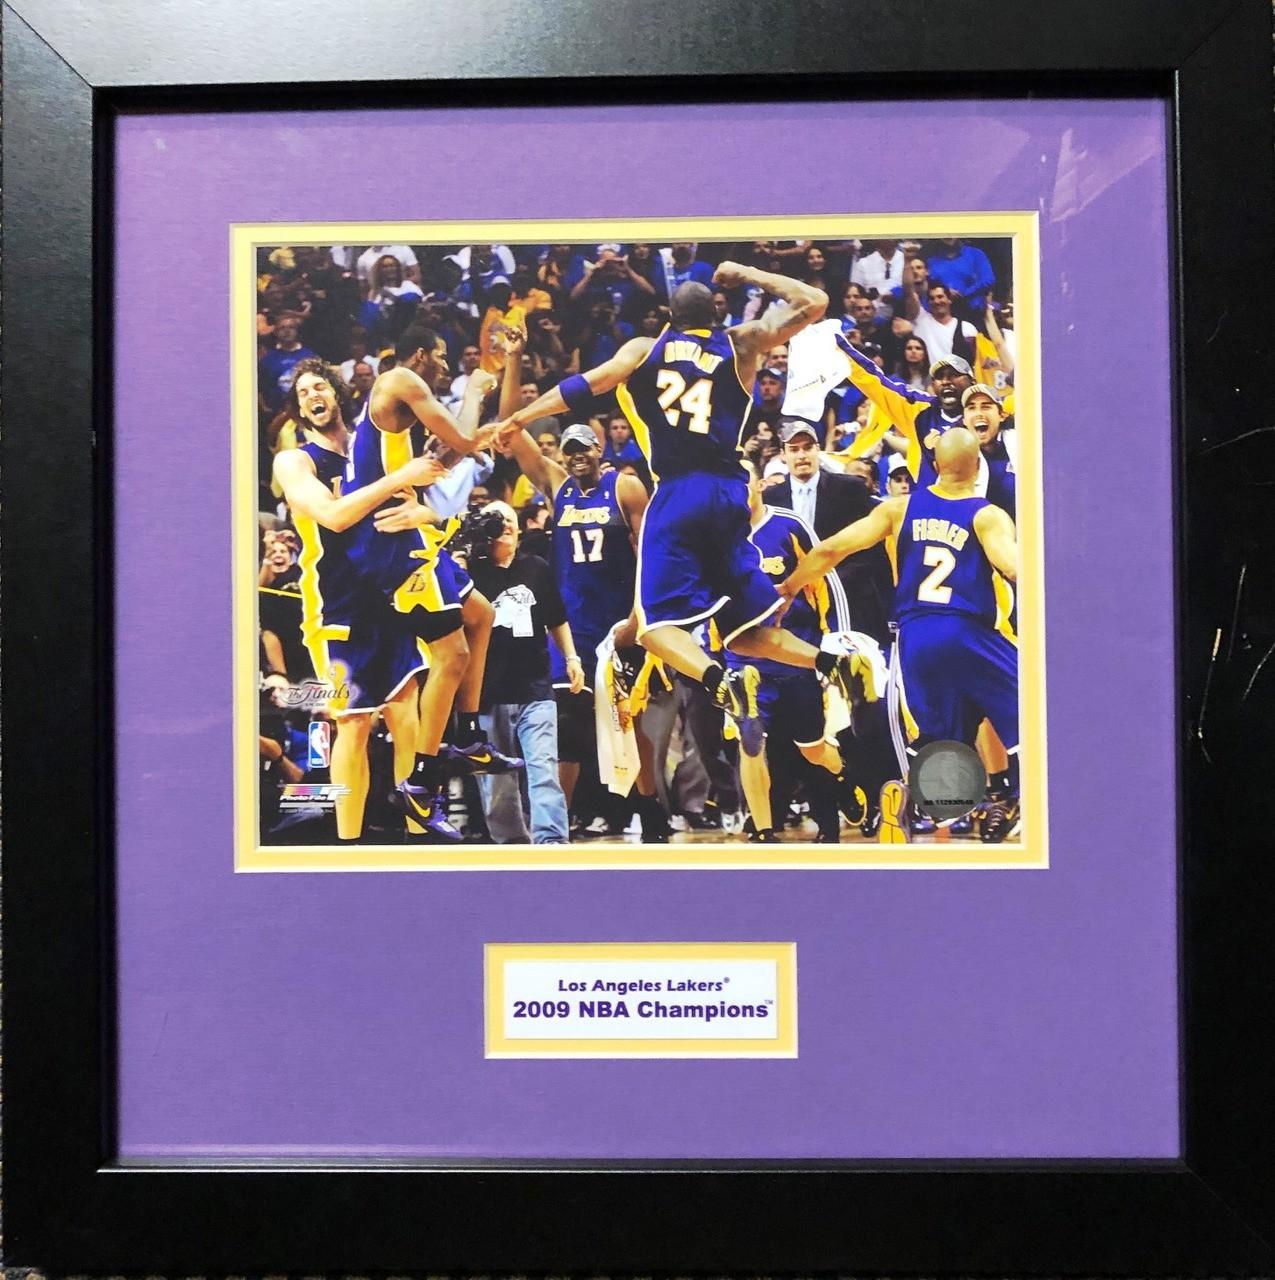 9ca5f0f3a5a LA Lakers 2009 NBA Championship Photo Plaque - Nikco Sports